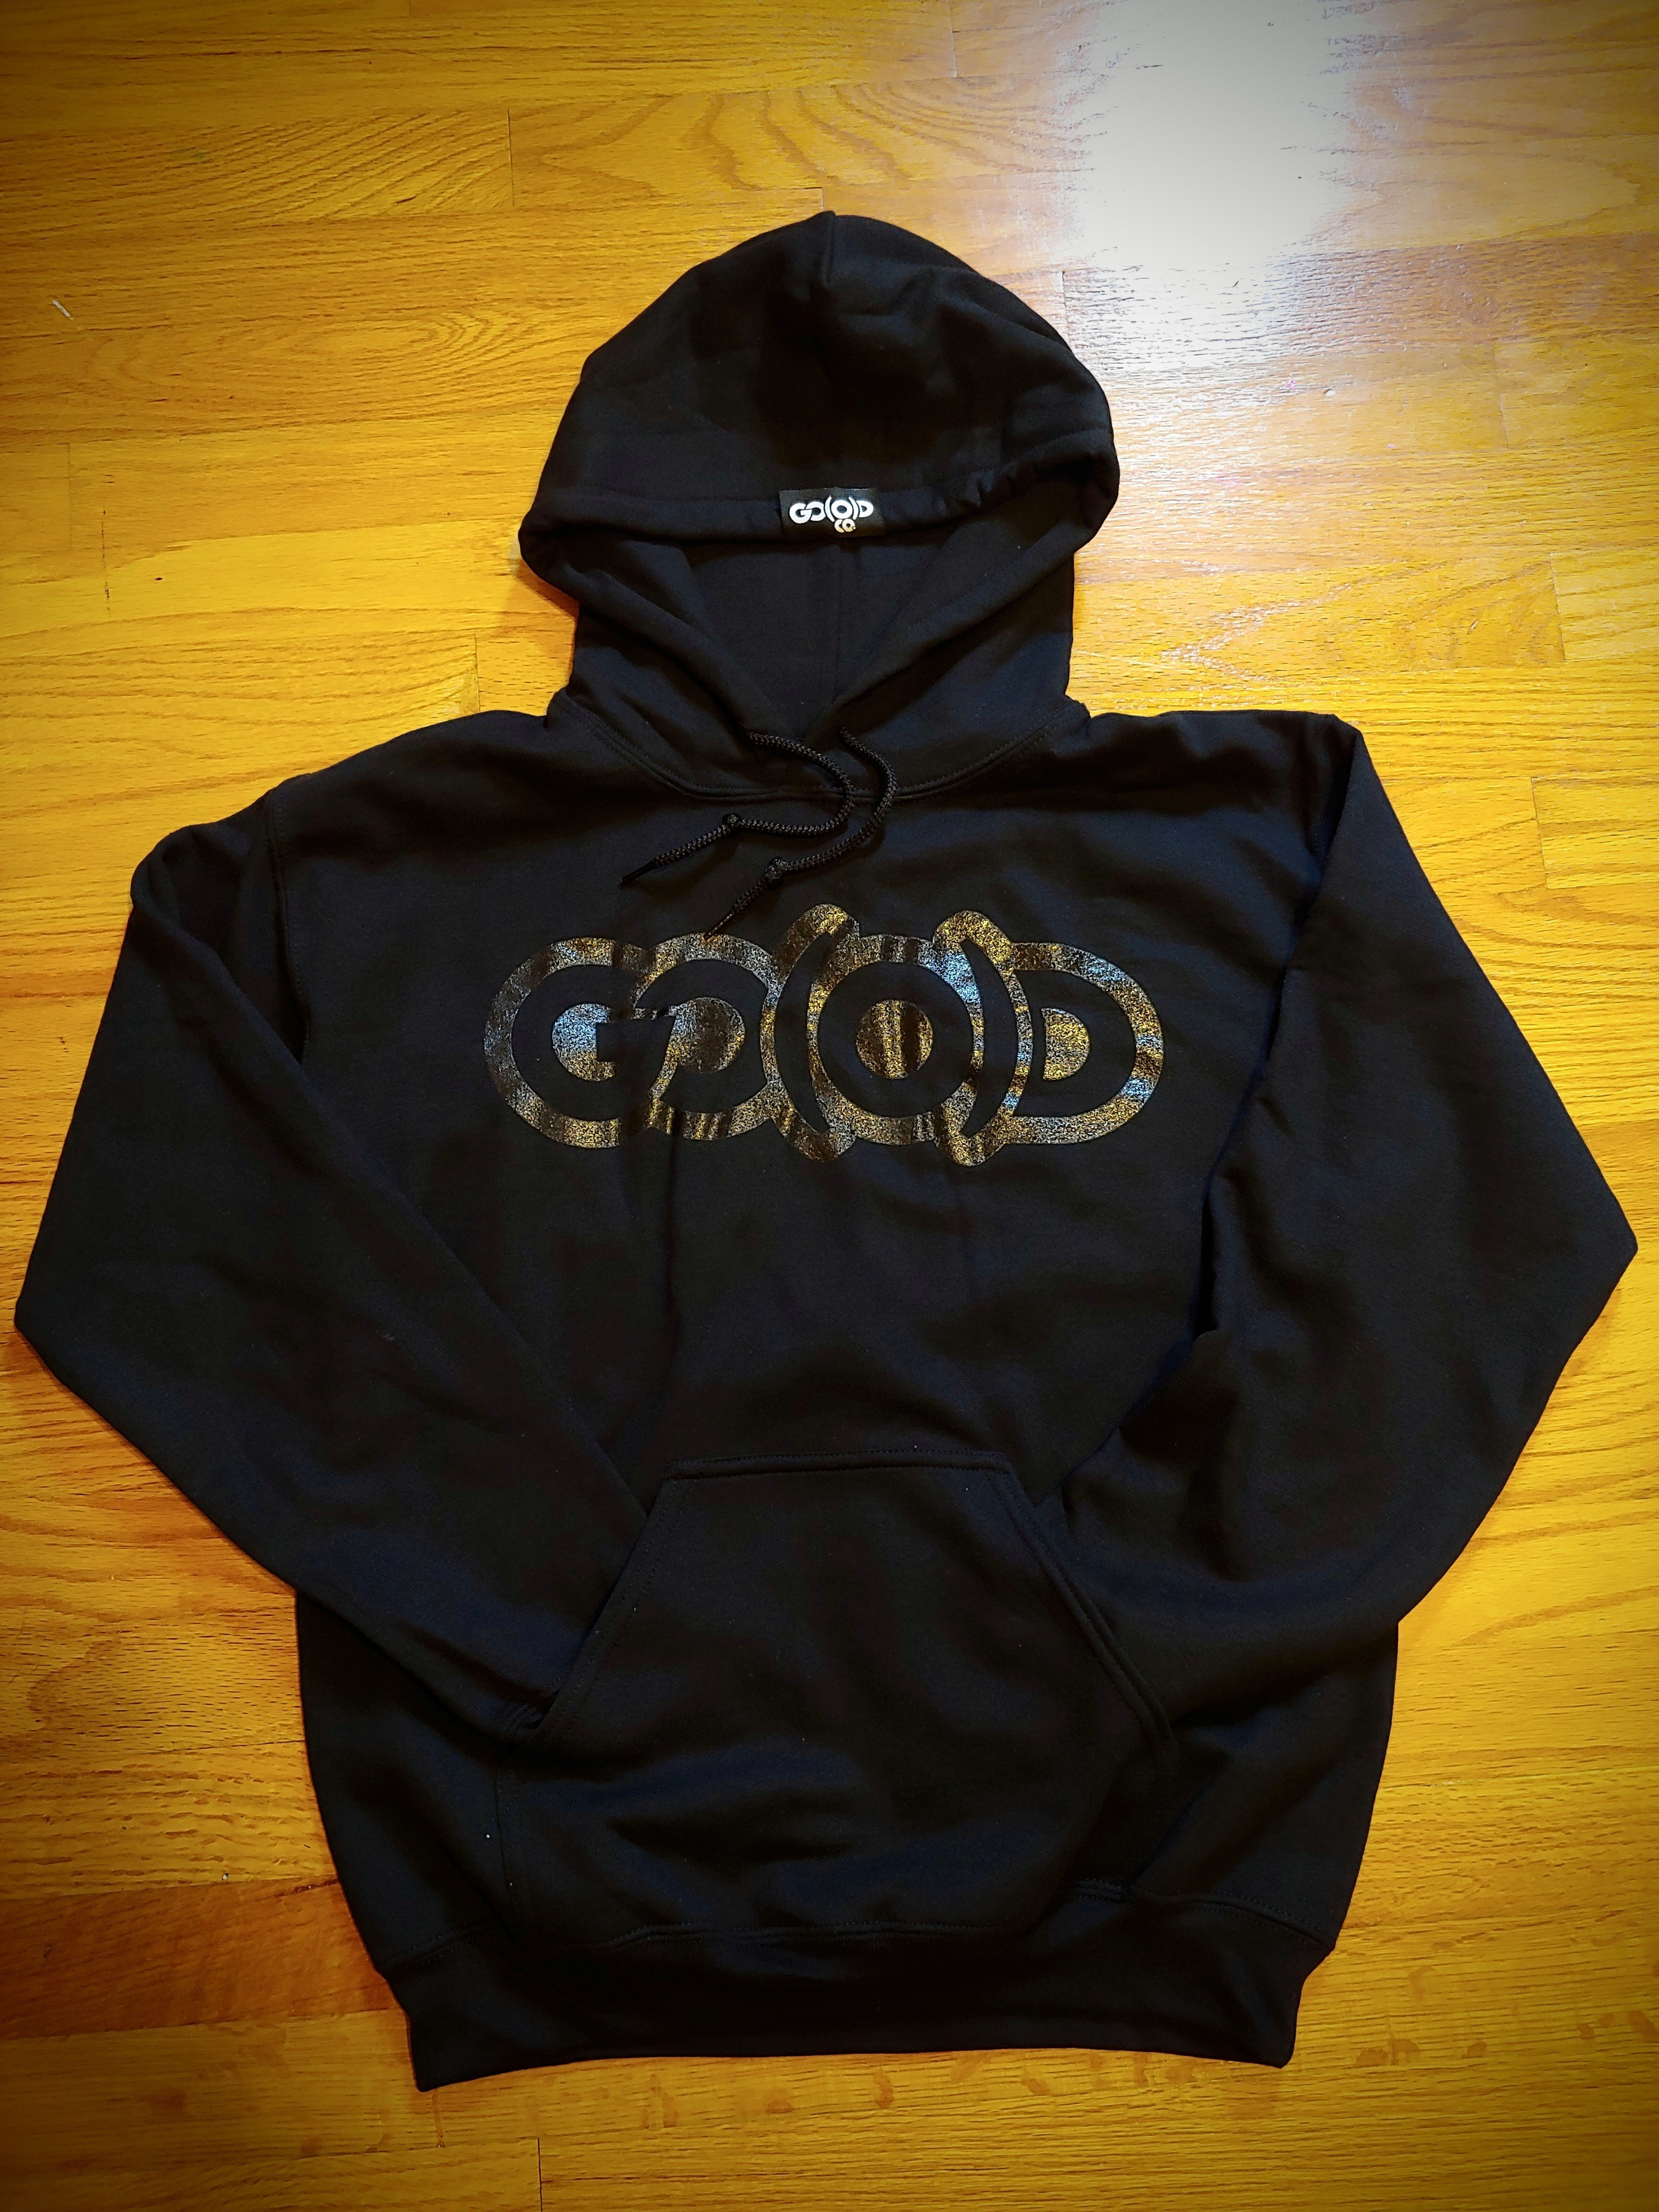 GO(O)D Hoodie-black/black 00014